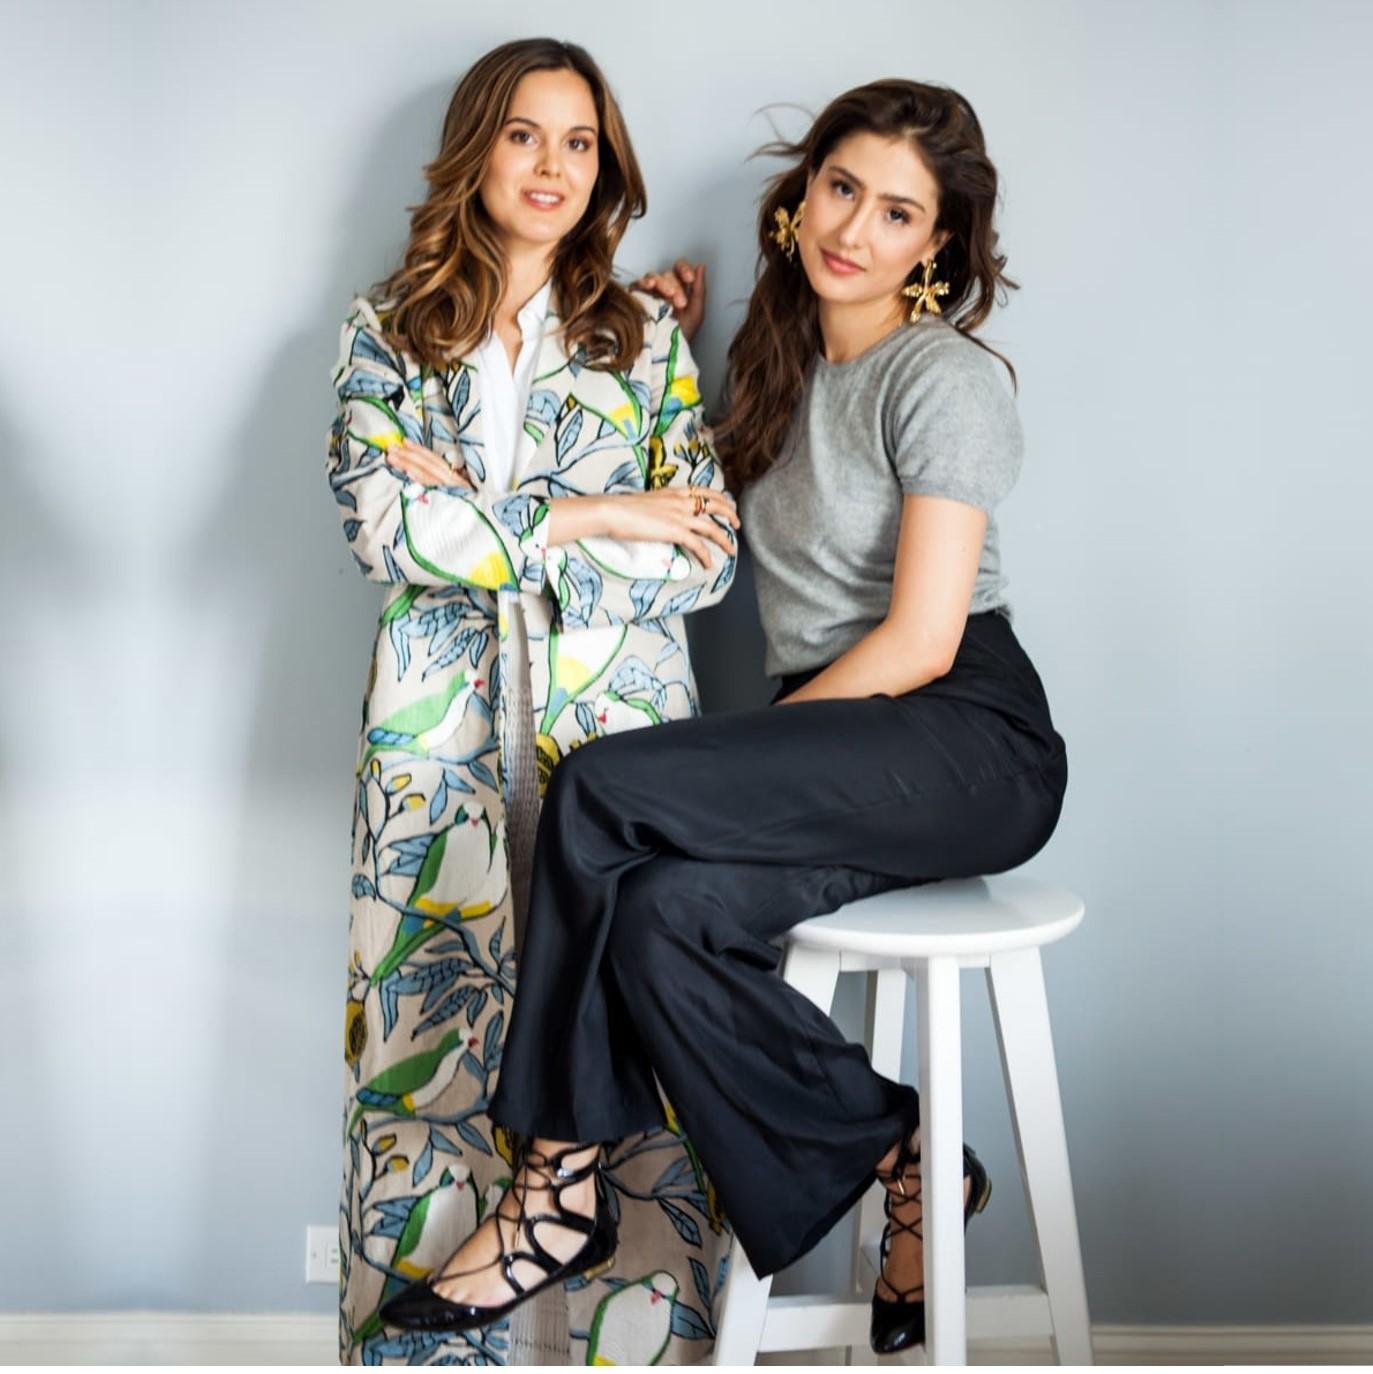 GIOVANNA CAMPAGNA - Dos Loros Kimono  #entrepreneur #latamfashion #creoconsulting #almagirl #girlboss  @ Paris for an Interview for TagWalk